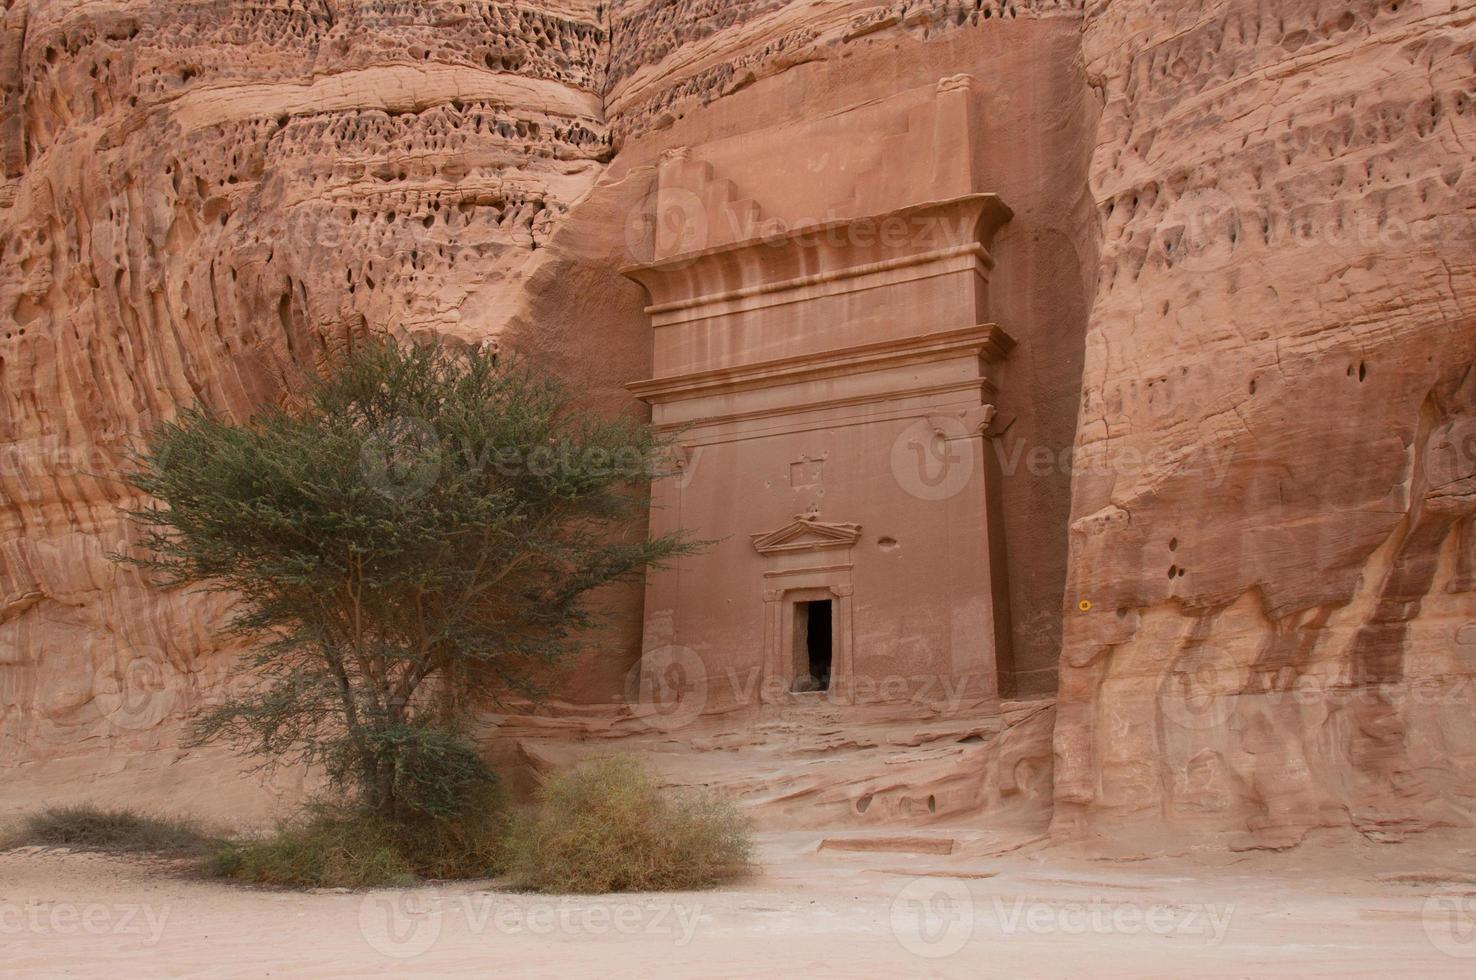 nabatean grav i Madain Saleh arkeologiska plats, Saudiarabien foto